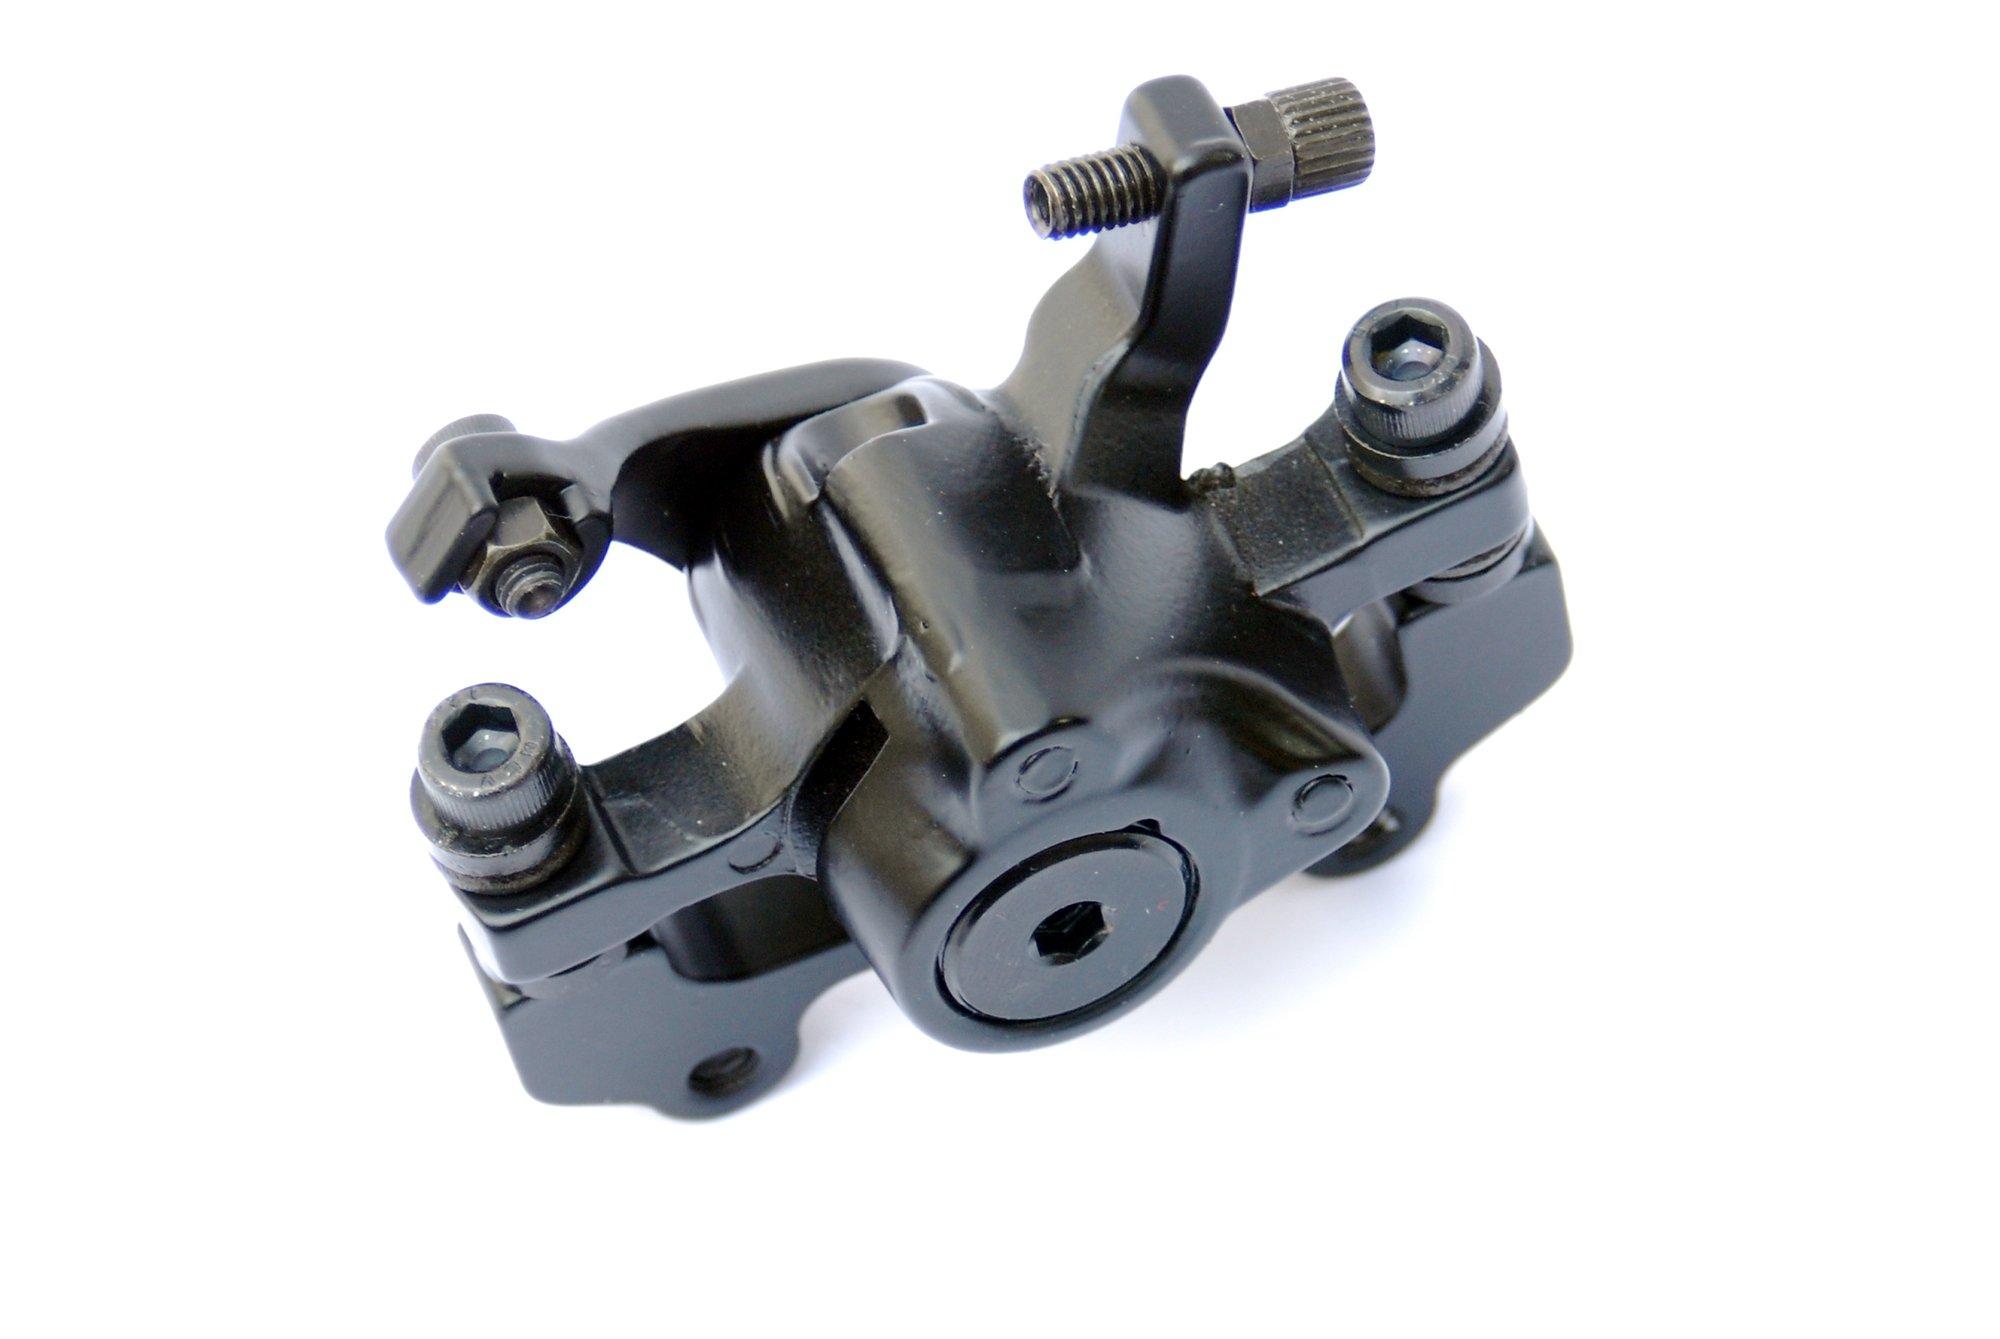 Artek Bike Rear Mechanical Cable Disc Brake Caliper /& Rotor Set 160mm inc Bolts